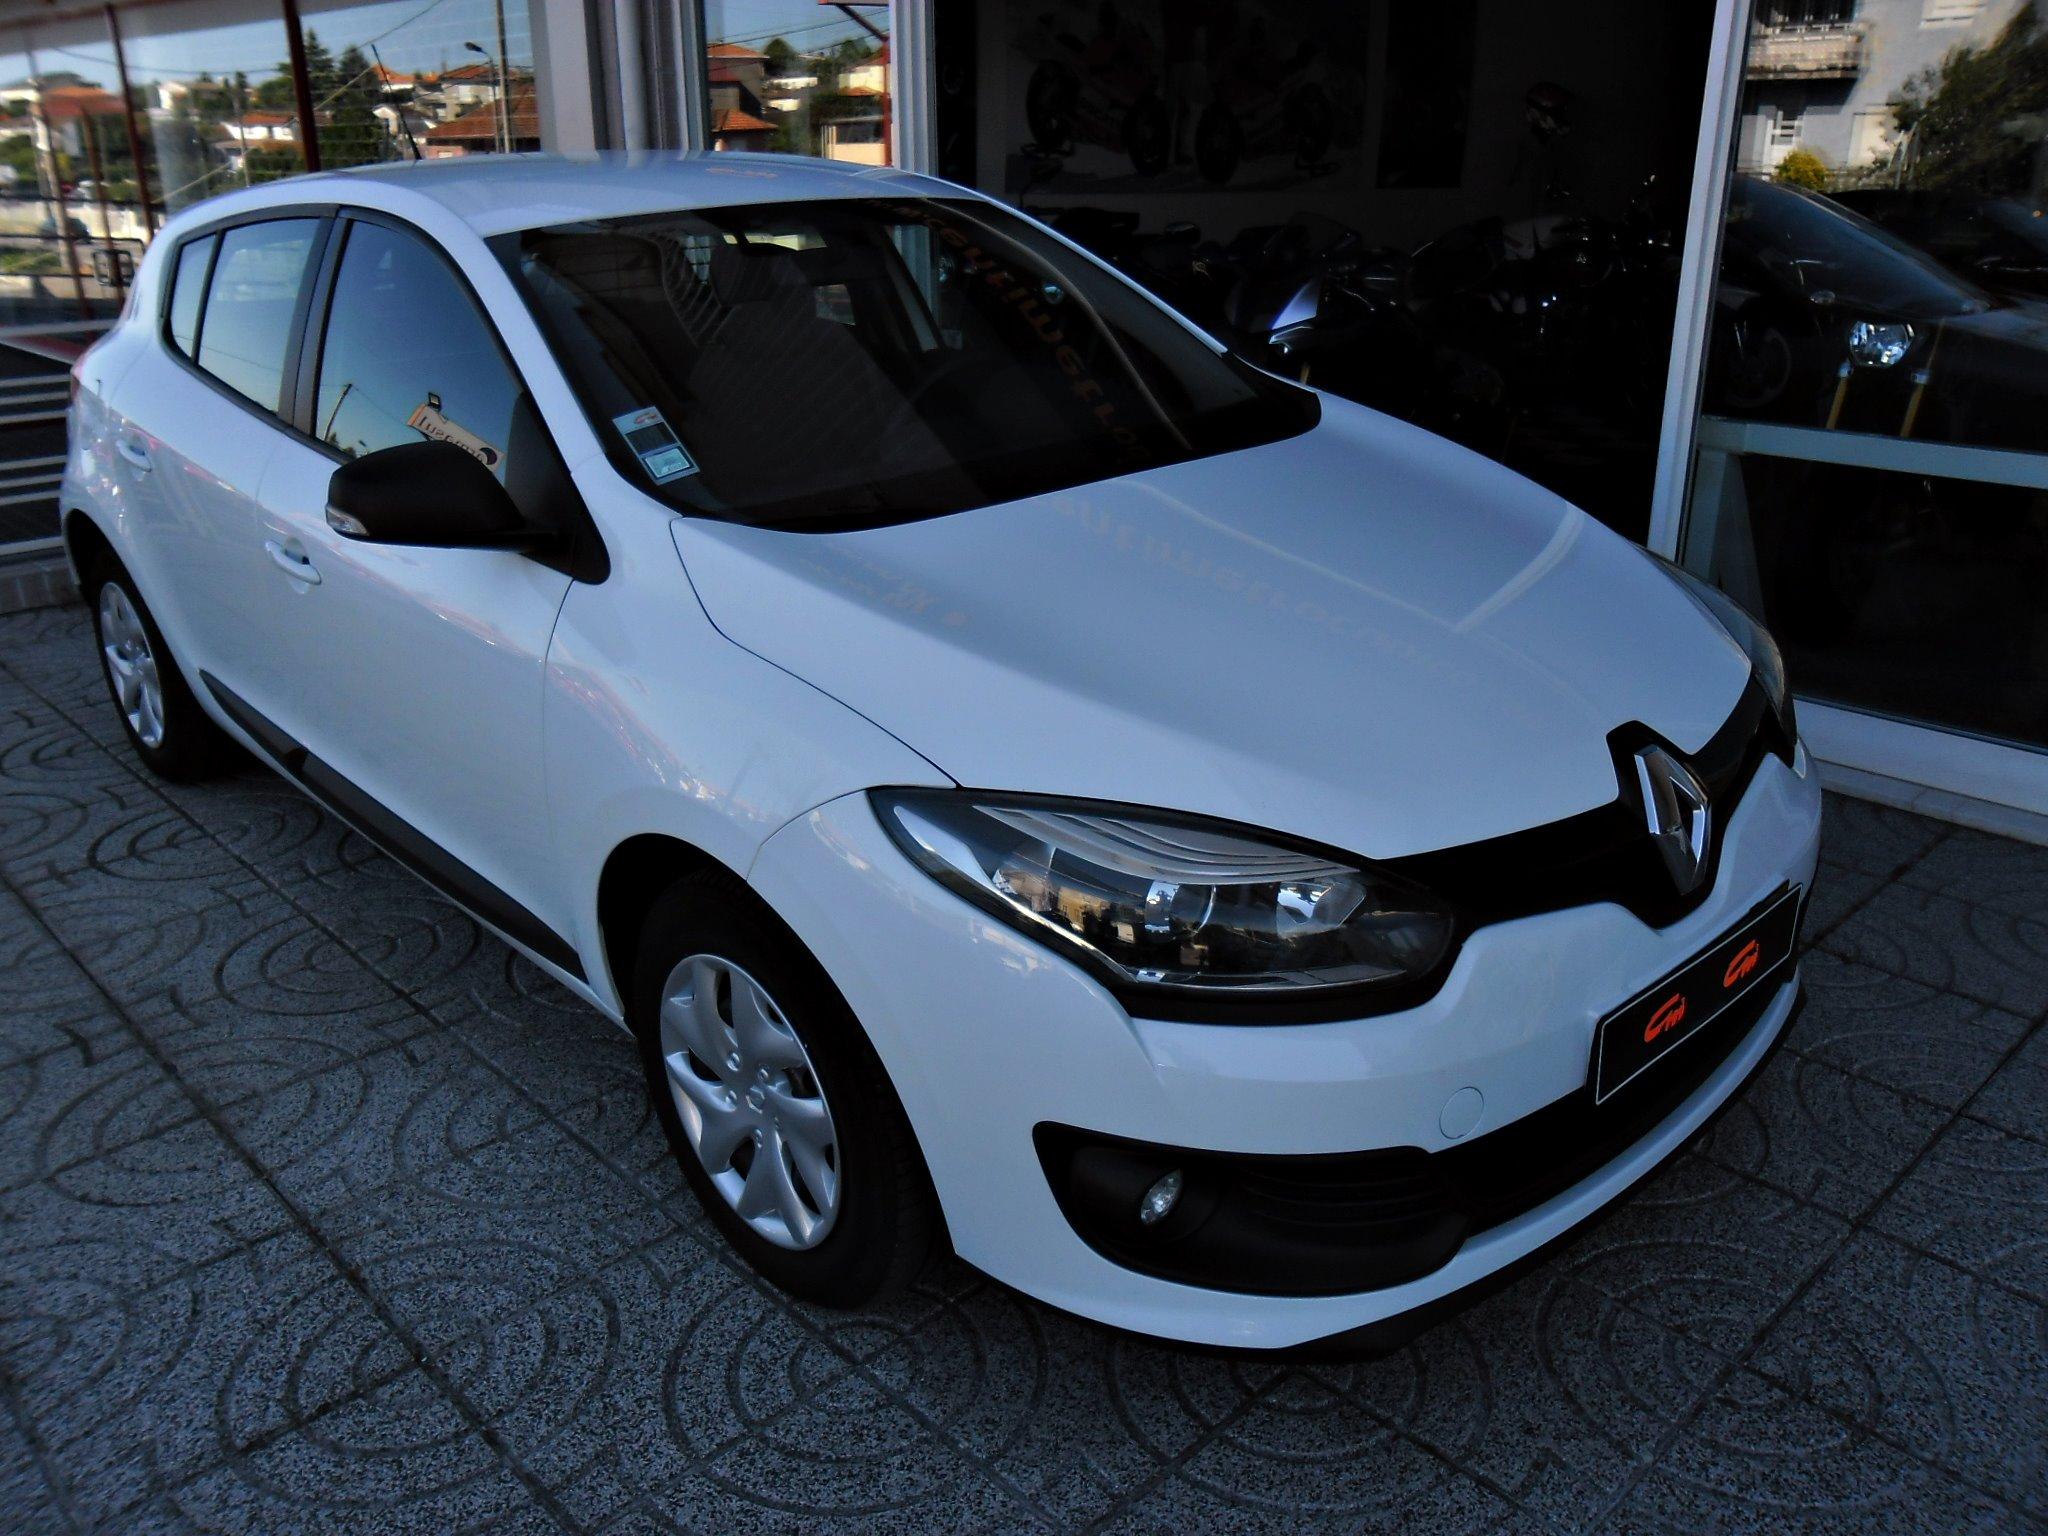 Renault Megane Van 1.5 Dci 110cv